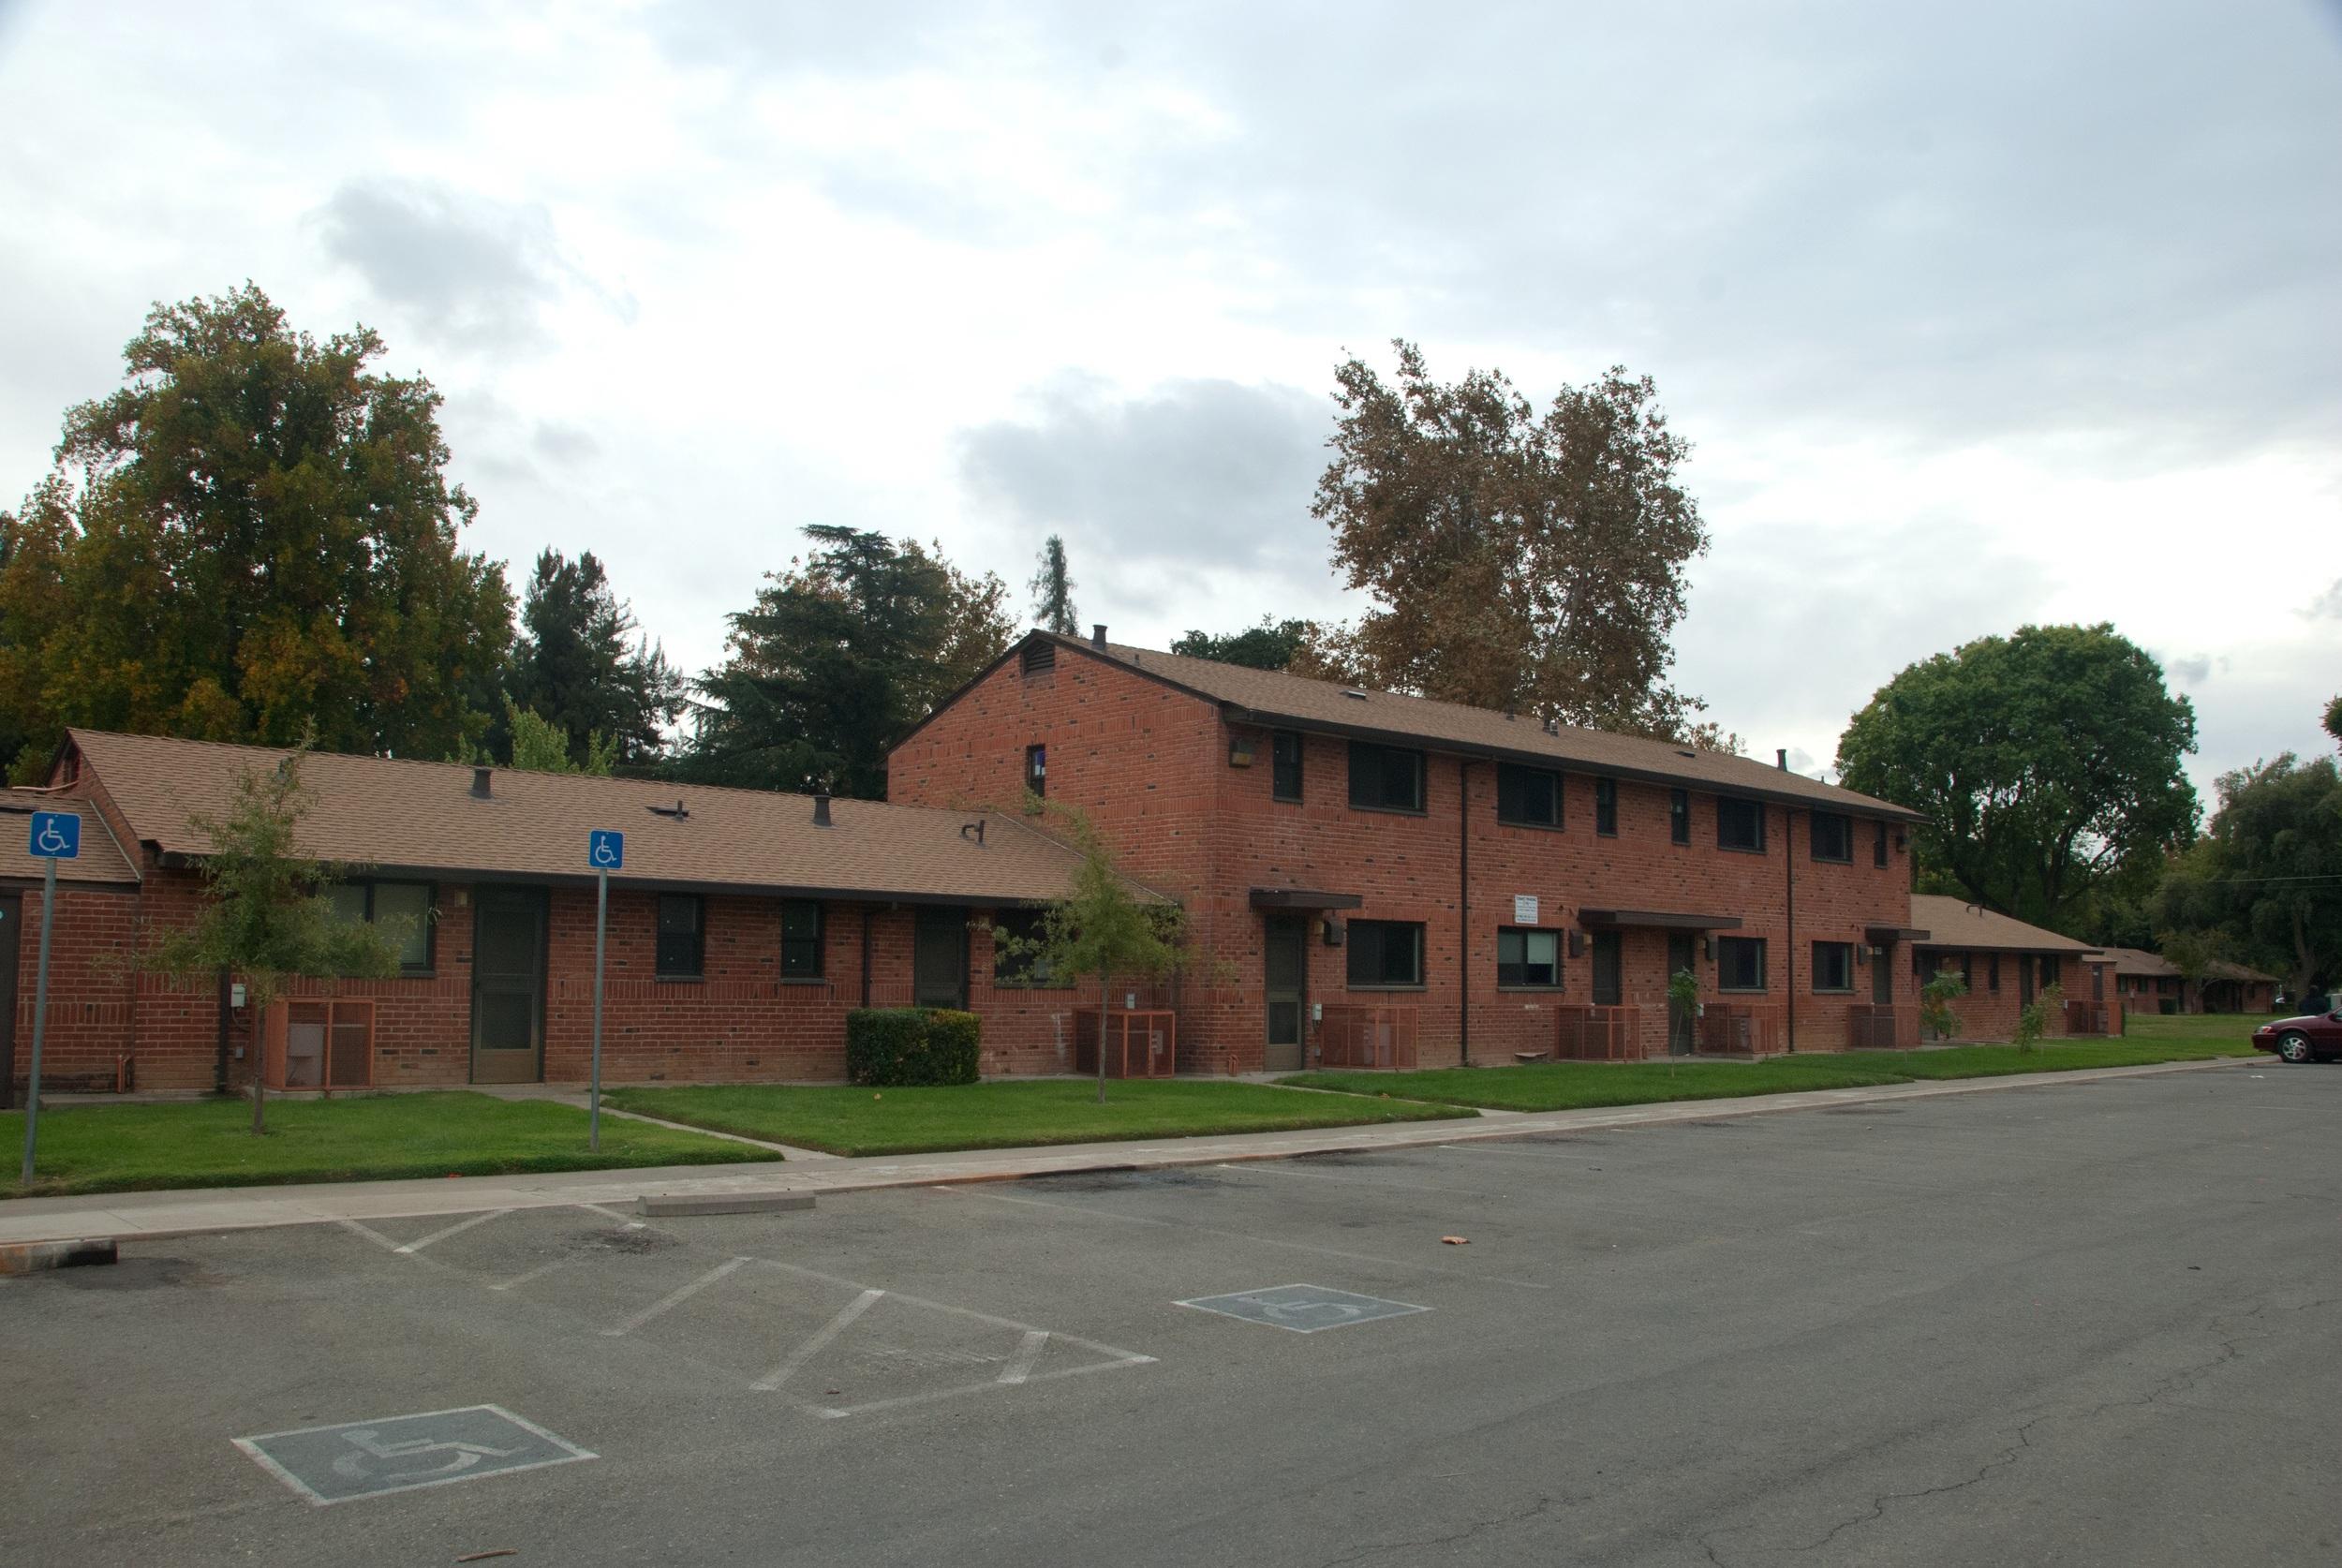 CA_Sacramento_New_Helvetia_Historic_District_0006.jpg